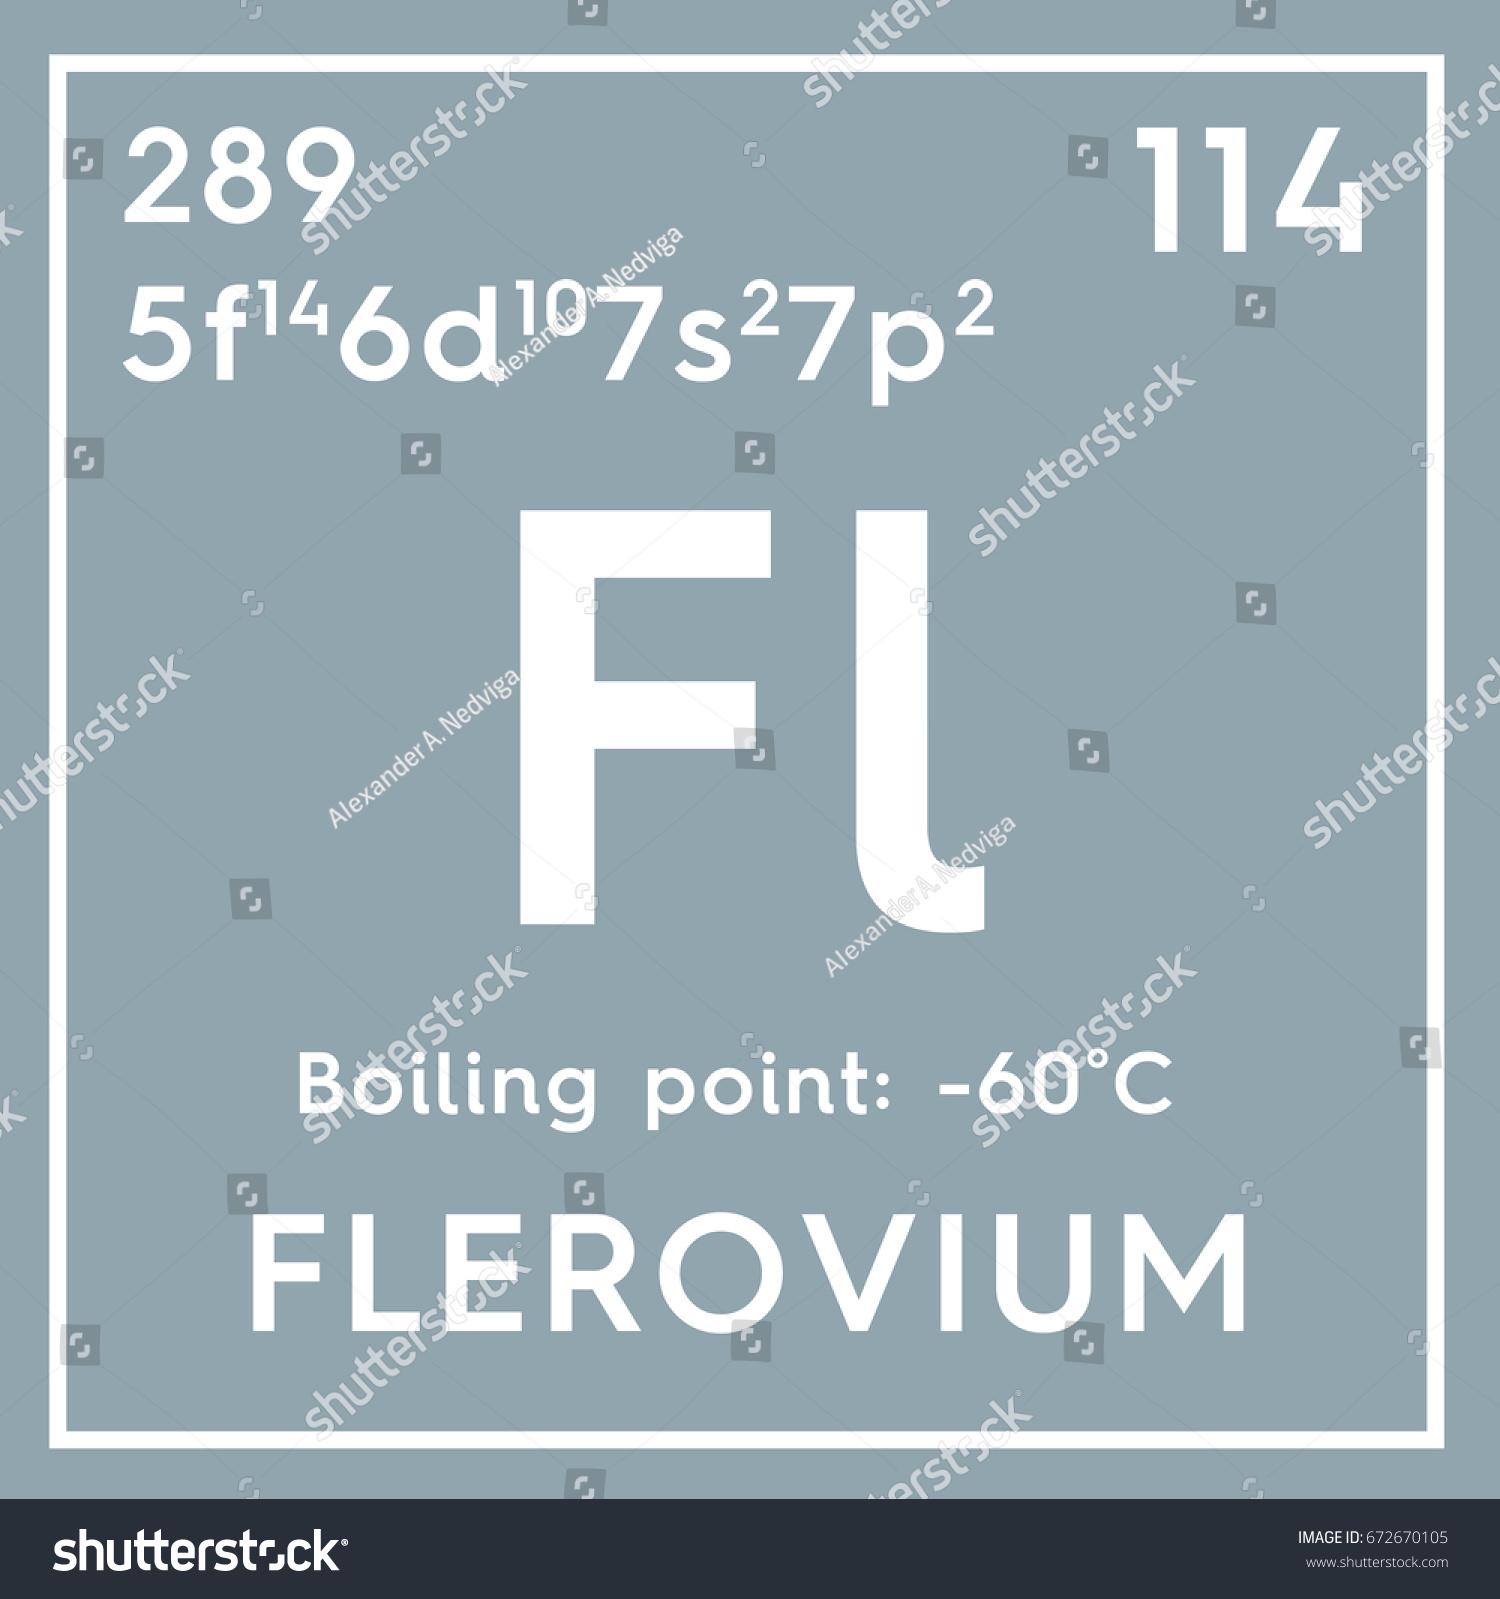 Flerovium posttransition metals chemical element mendeleevs stock post transition metals chemical element of mendeleevs periodic table flerovium in gamestrikefo Images